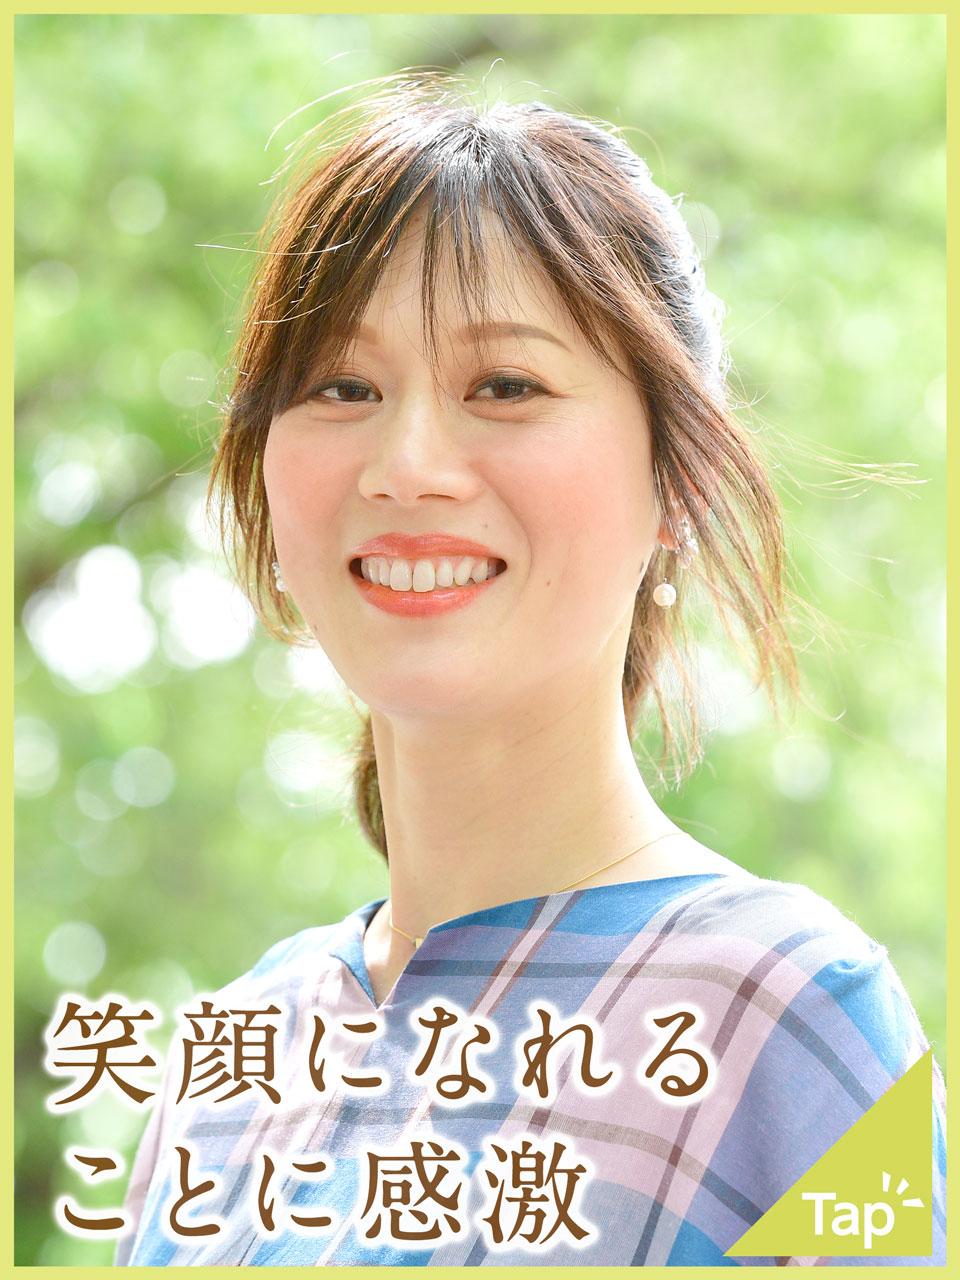 Saoriさん普段着